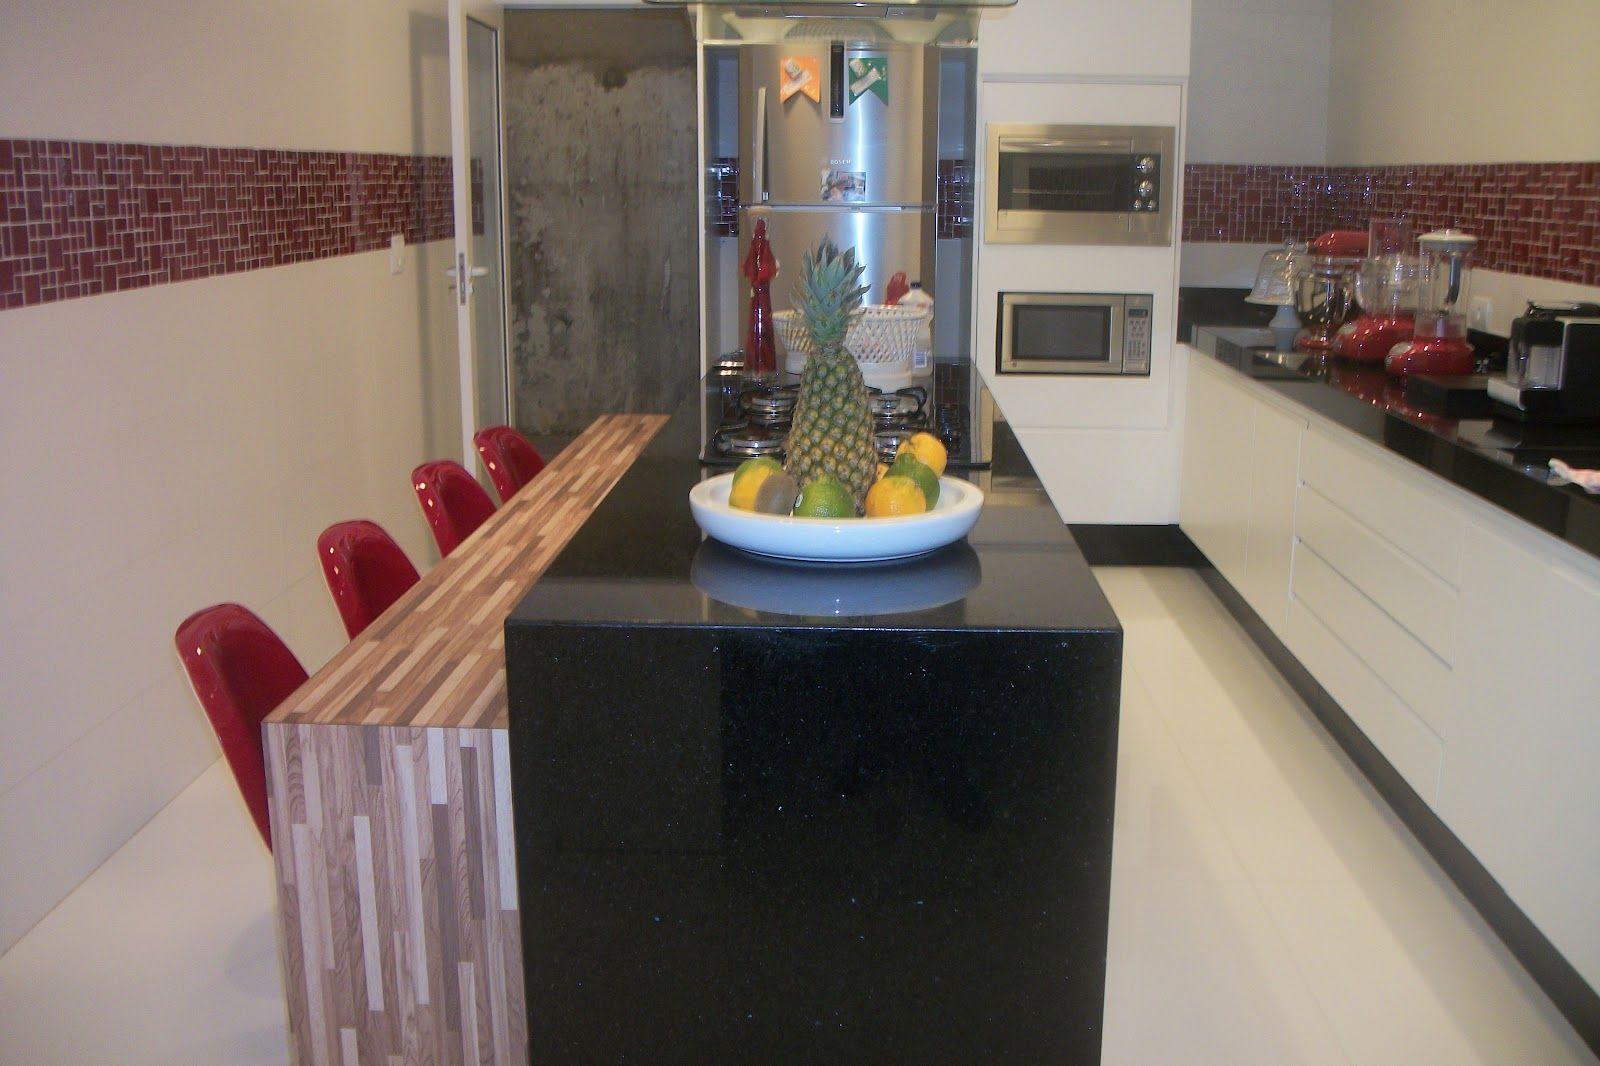 Cozinha Ap S Projeto De Ilha Central Circula O Entre Ilha E Pia